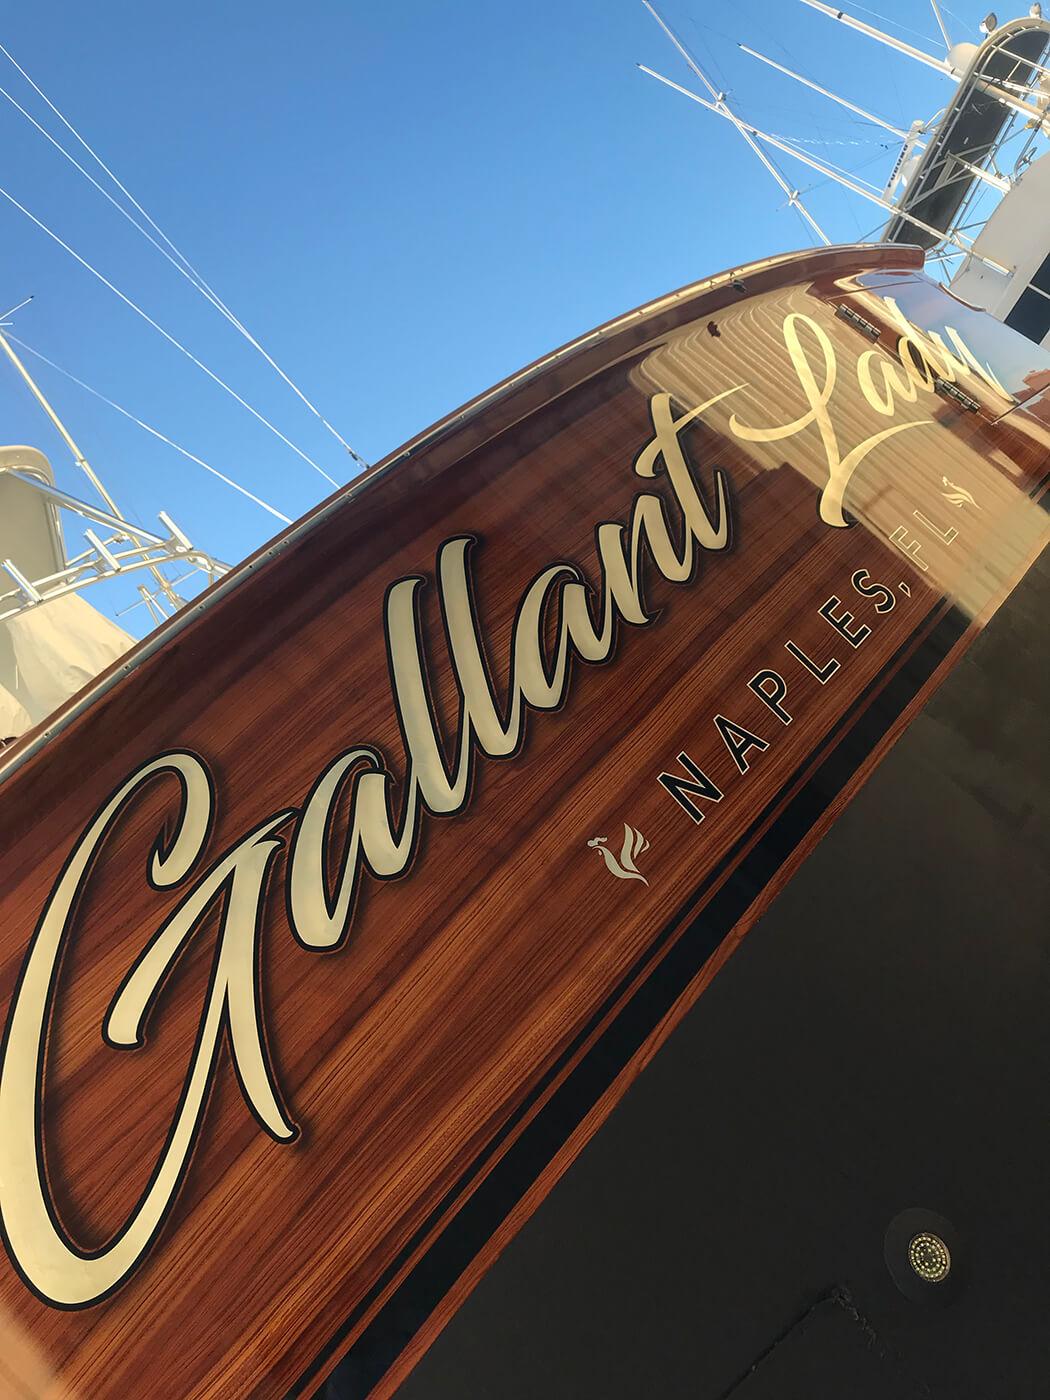 Gallant Lady Naples Florida Faux Teak transom detailed wood